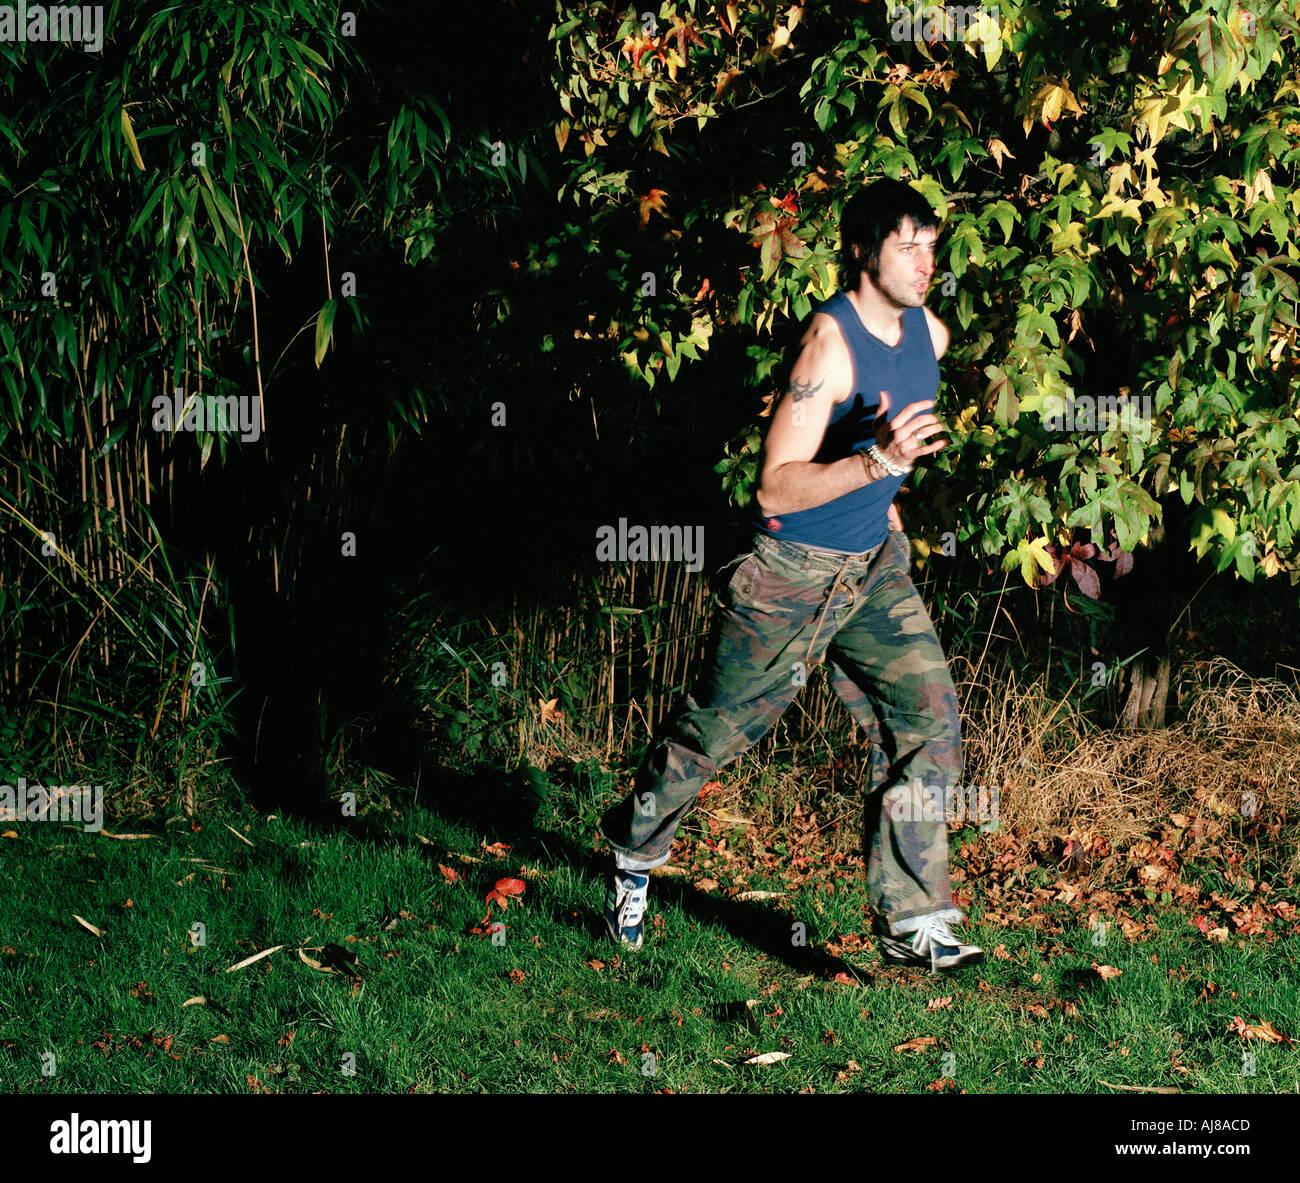 Mann läuft durch den Wald bei Nacht Stockbild